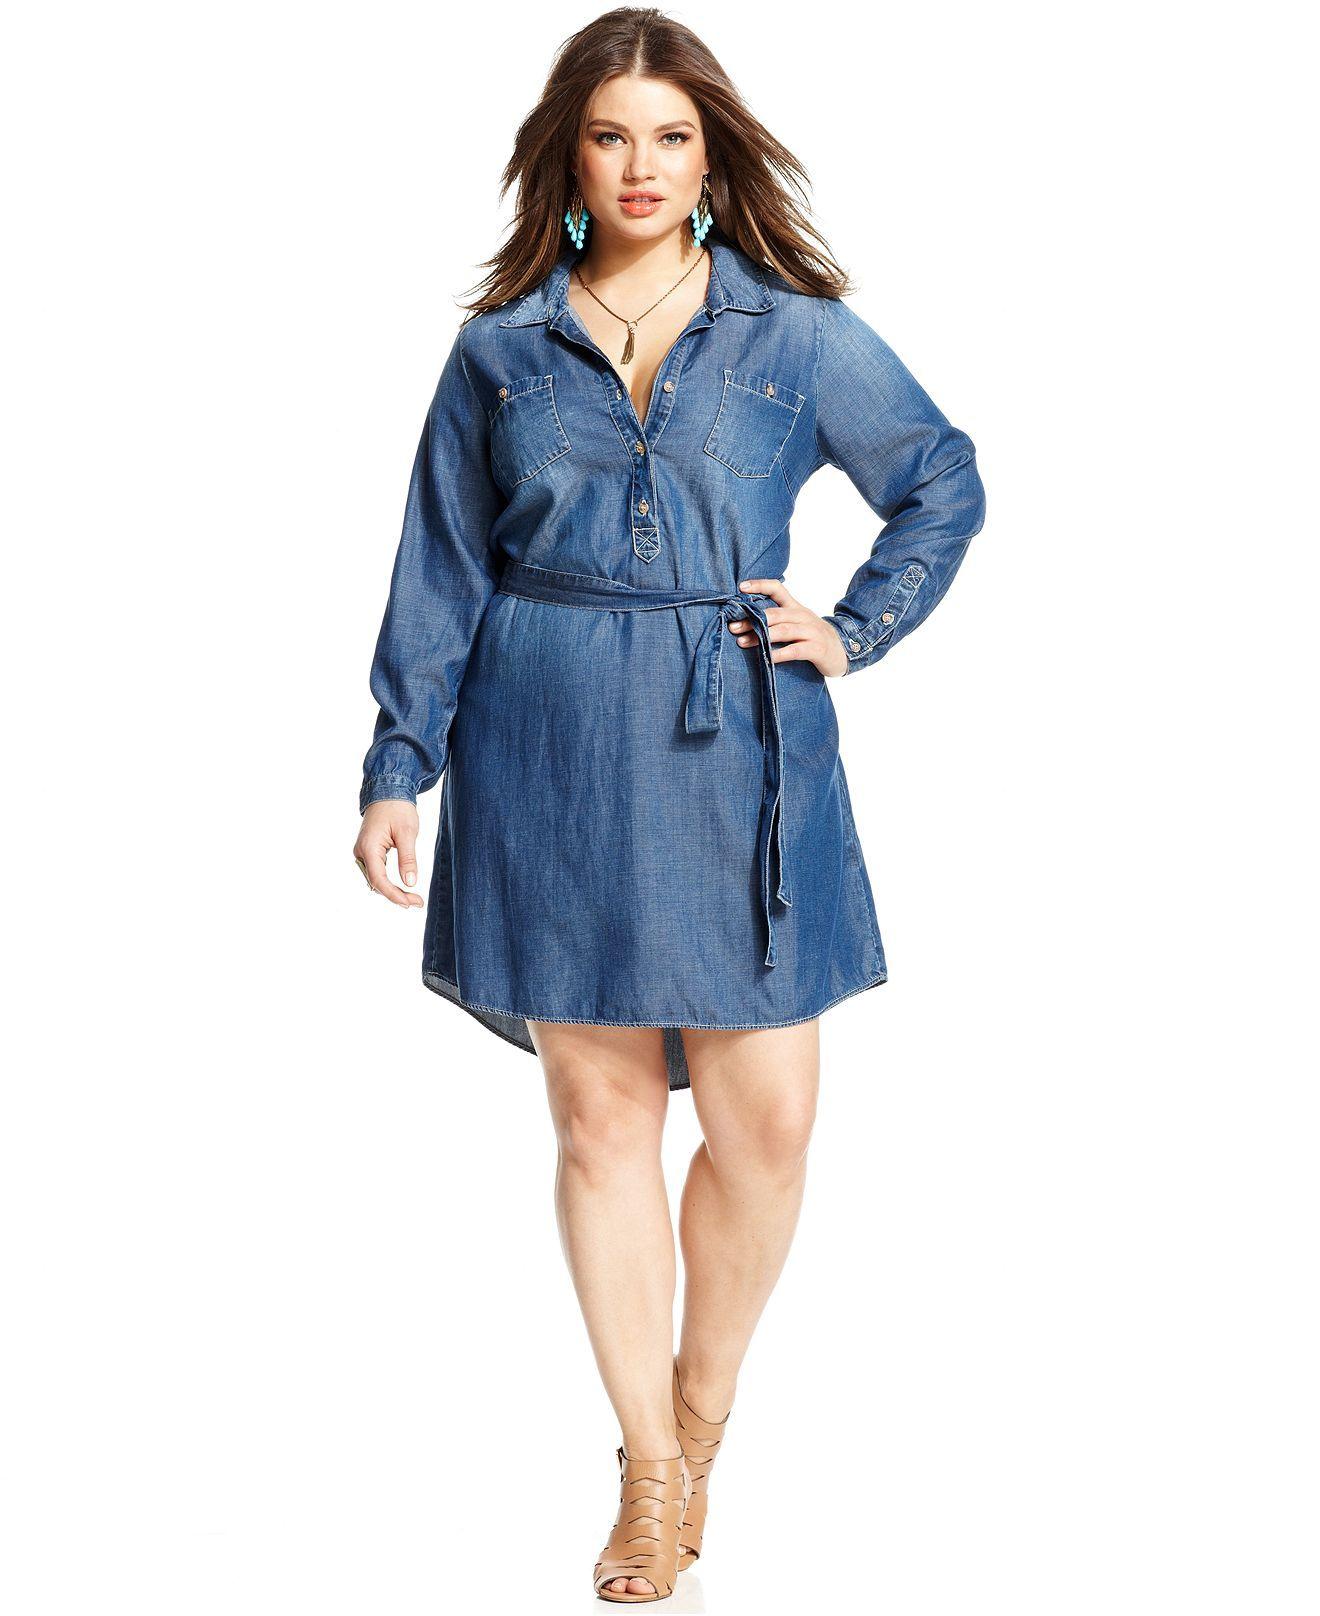 Plus Size Fashion Spotlight: 10 Fabulous Shirtdresses For Spring ...